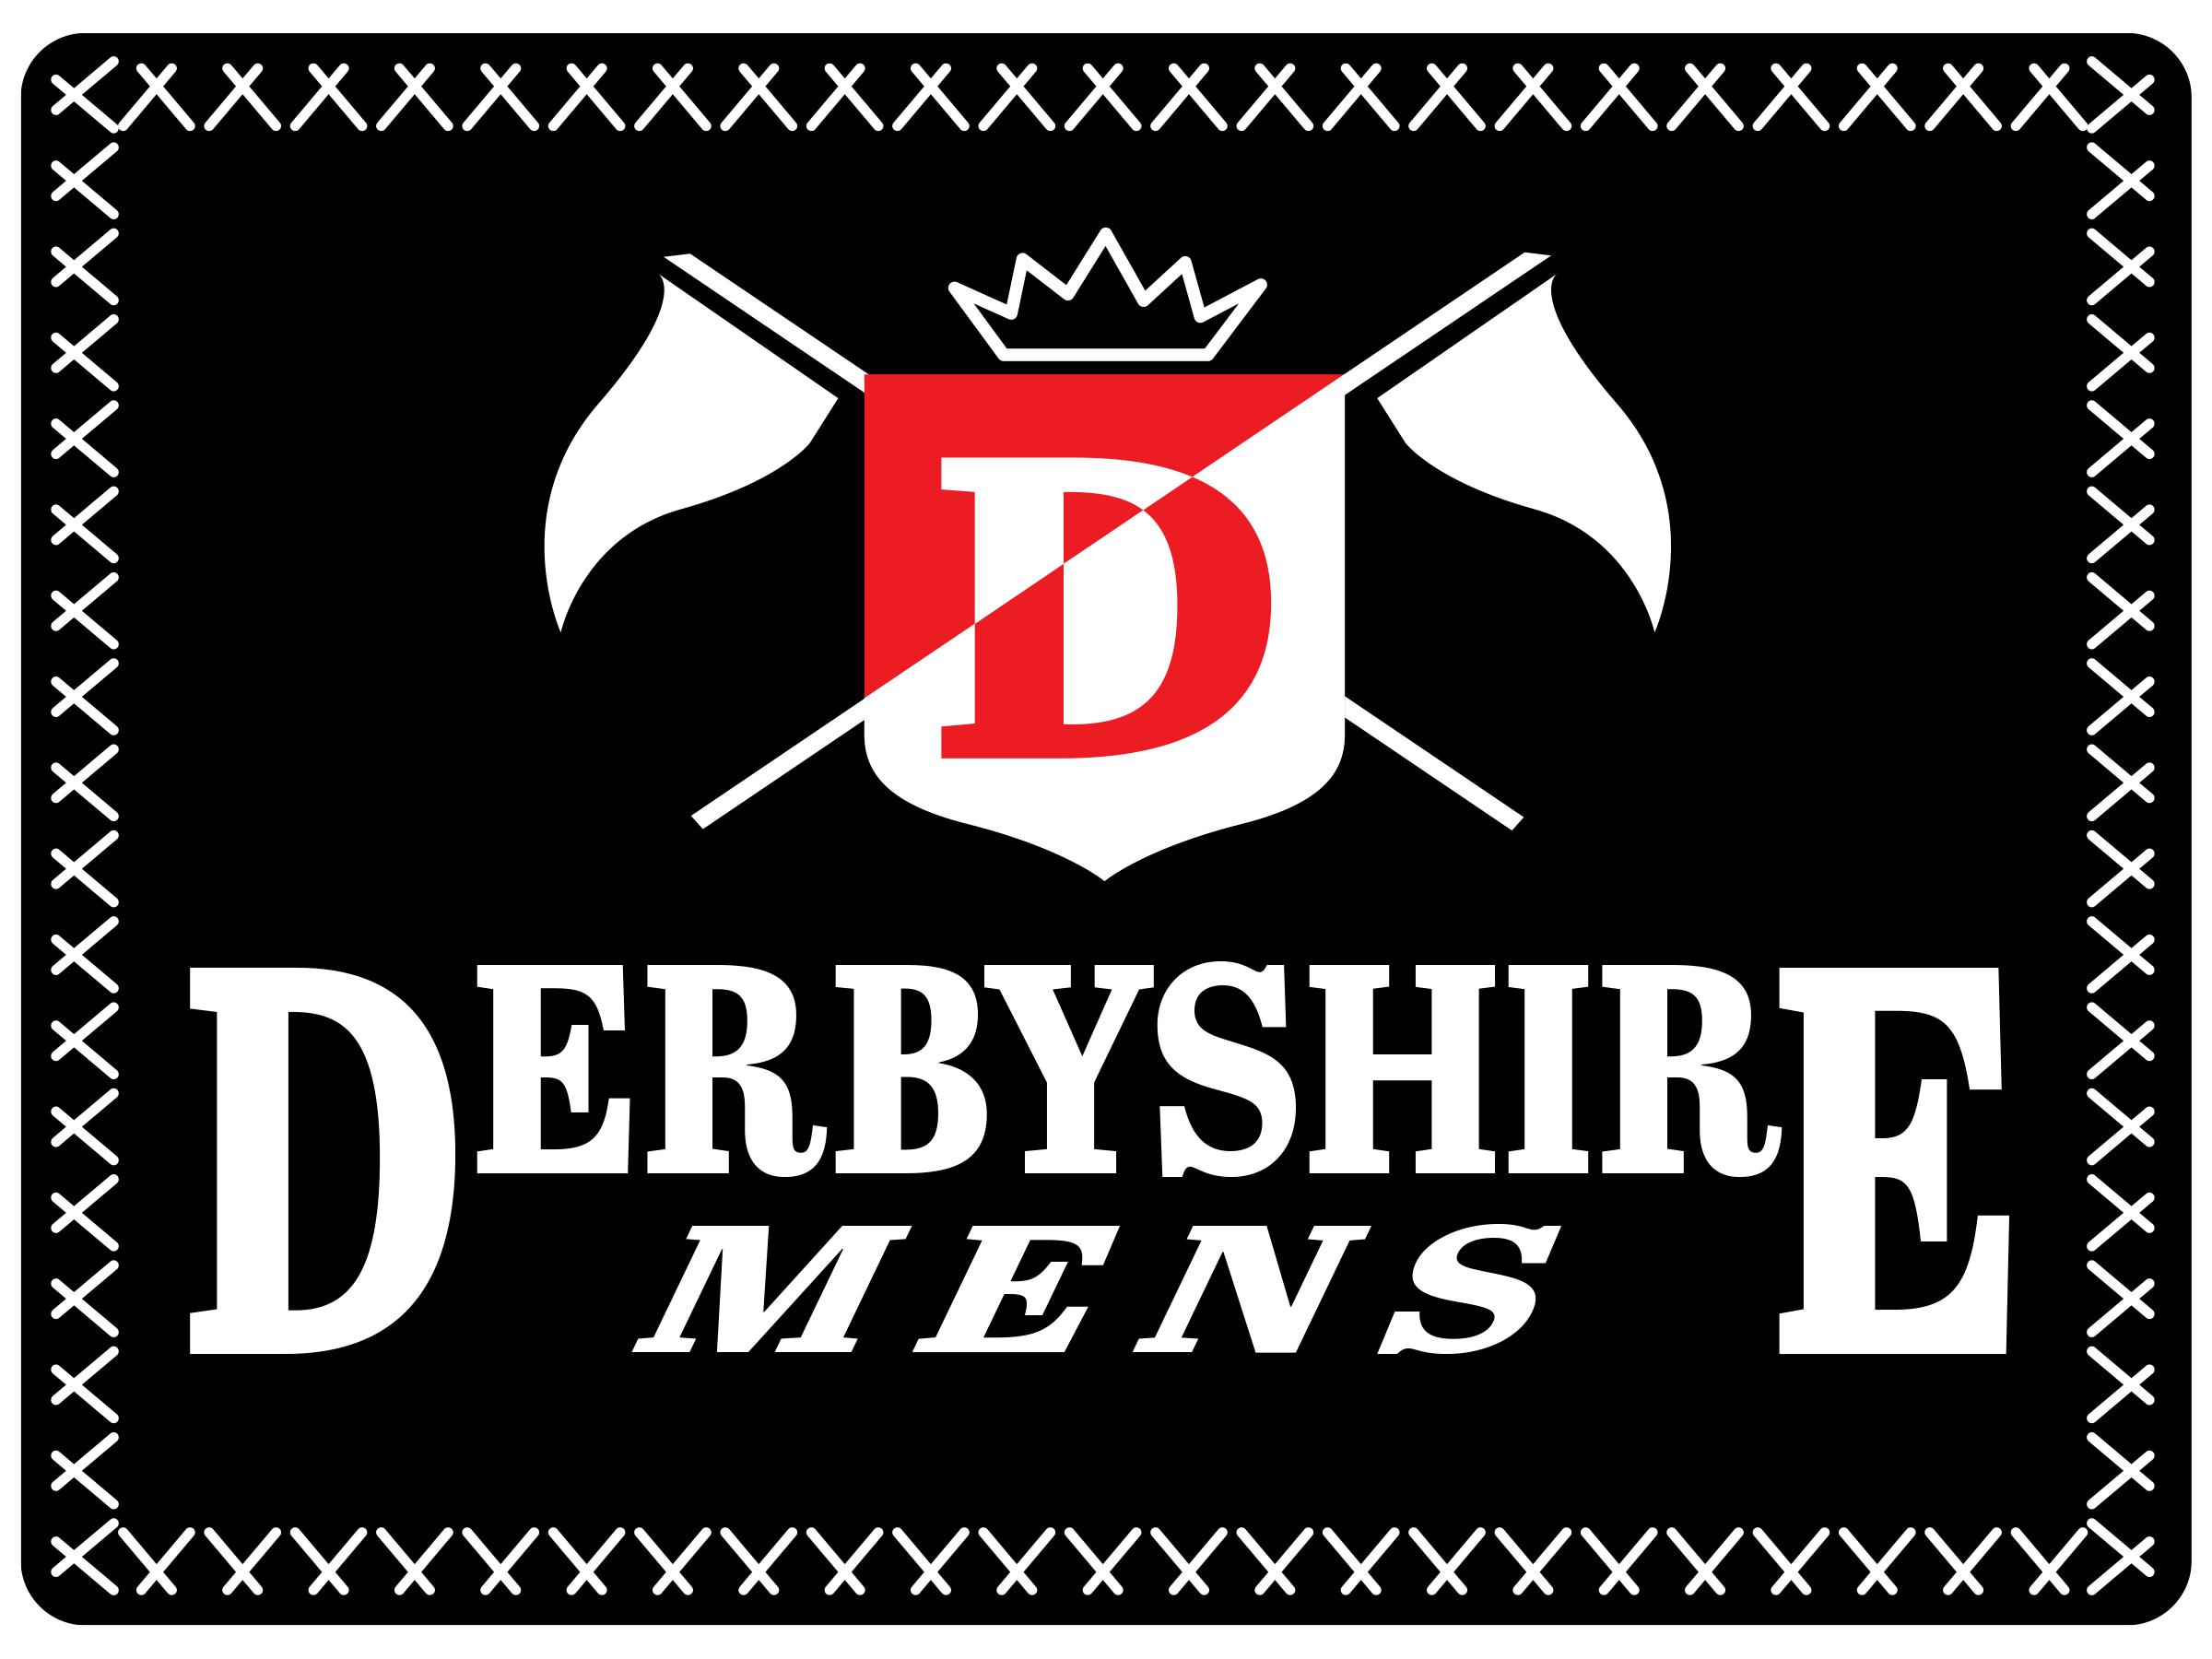 DERBYSHIRE MEN